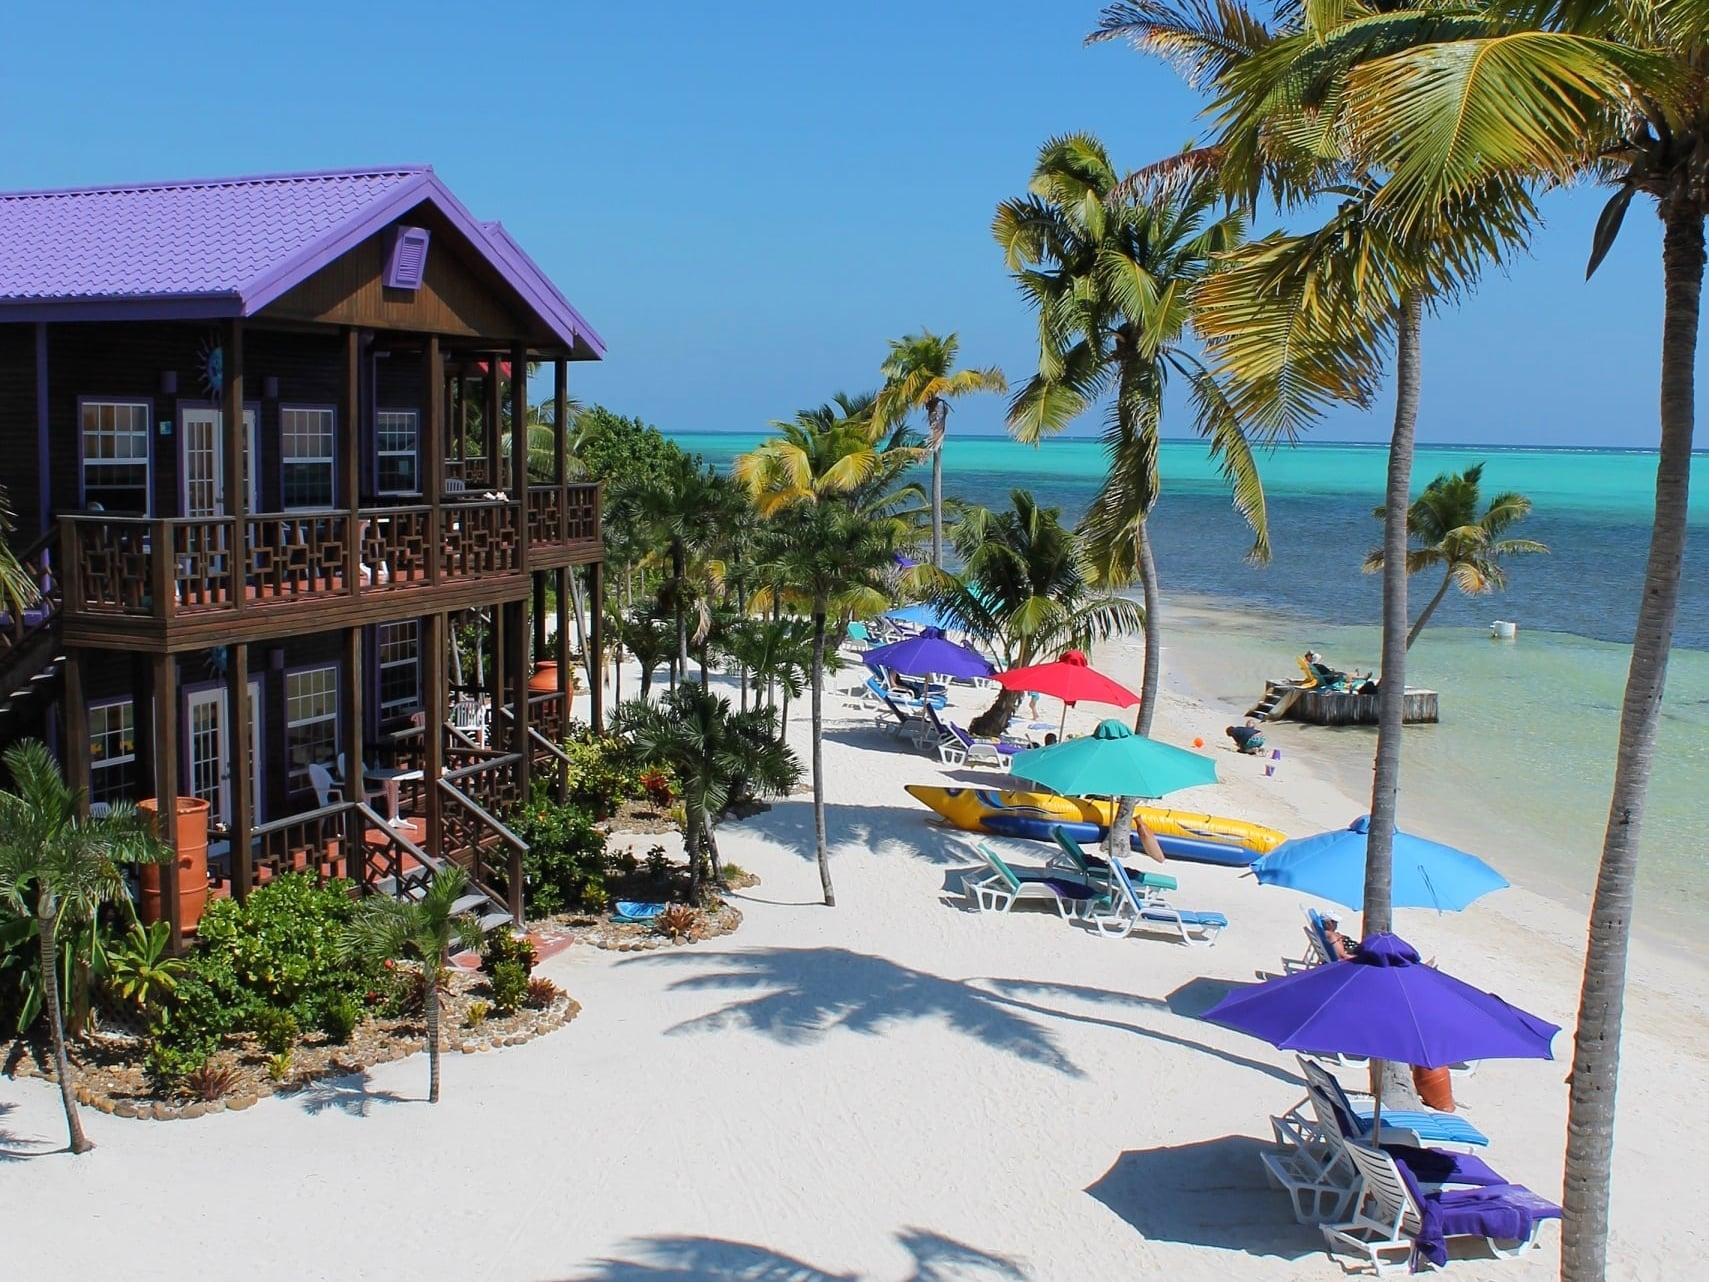 X'tan Ha Beach Resort, Ambergris Caye, Belize